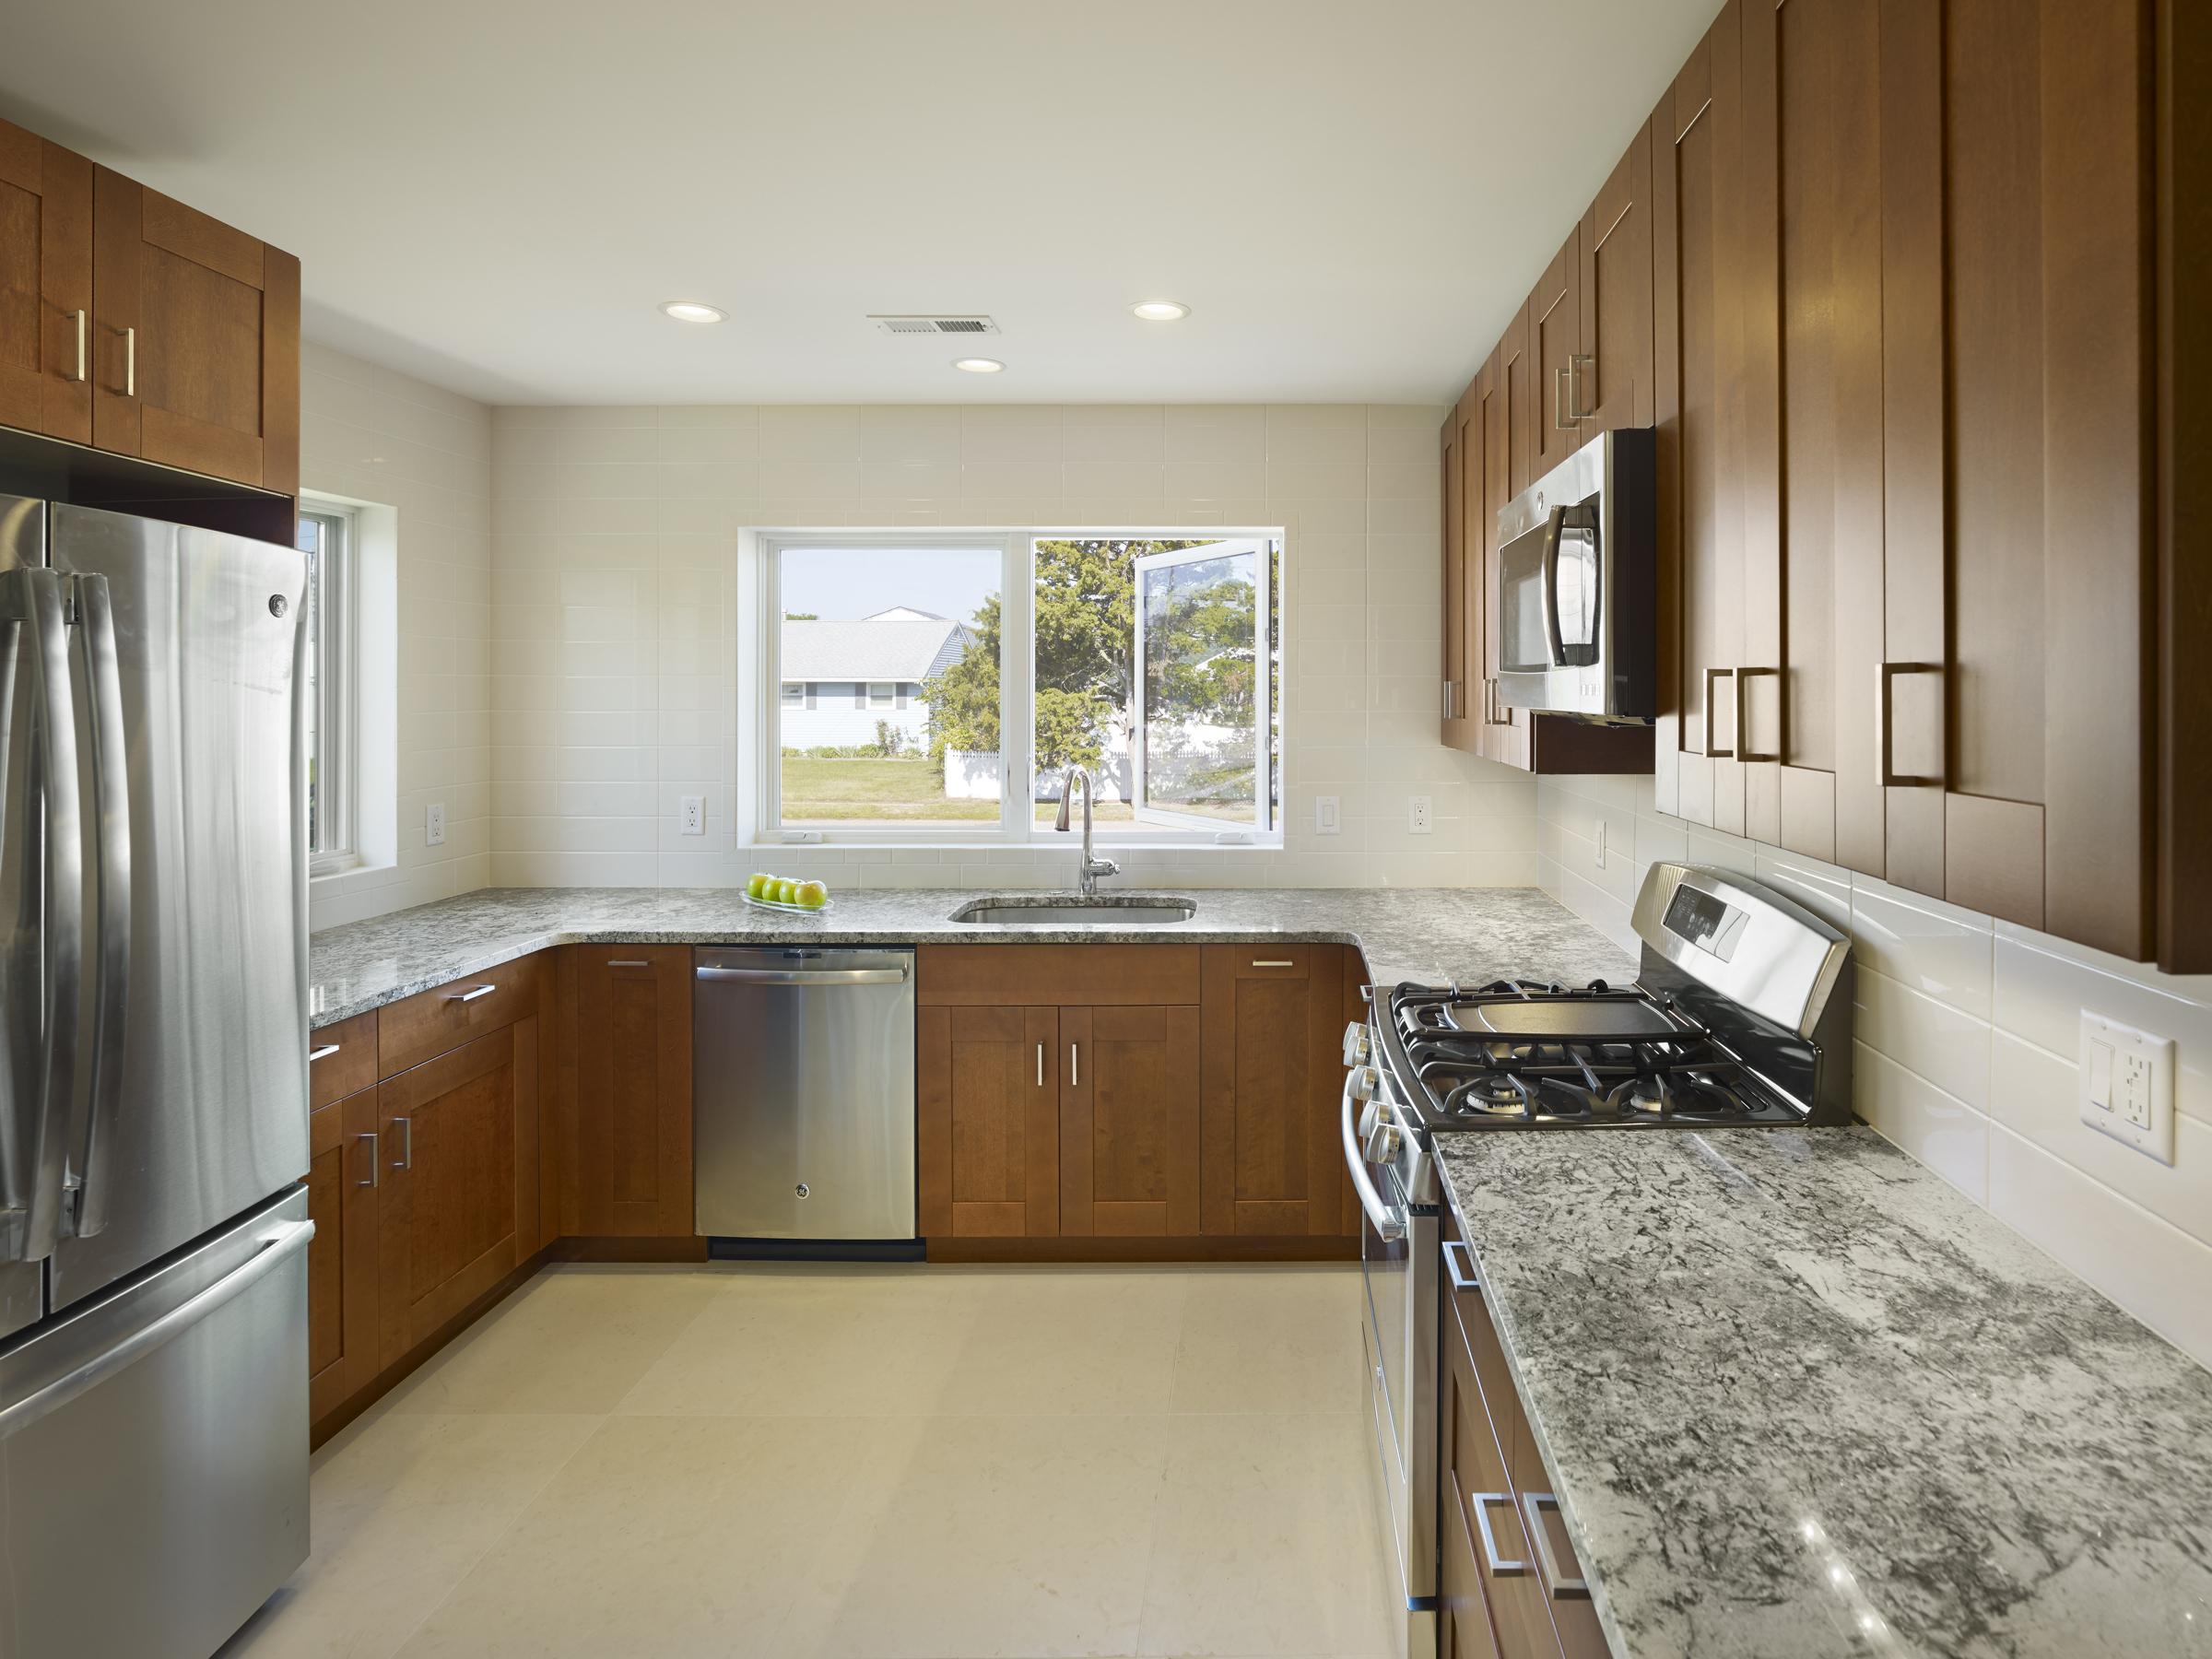 exit-0 kitchen_small.jpg